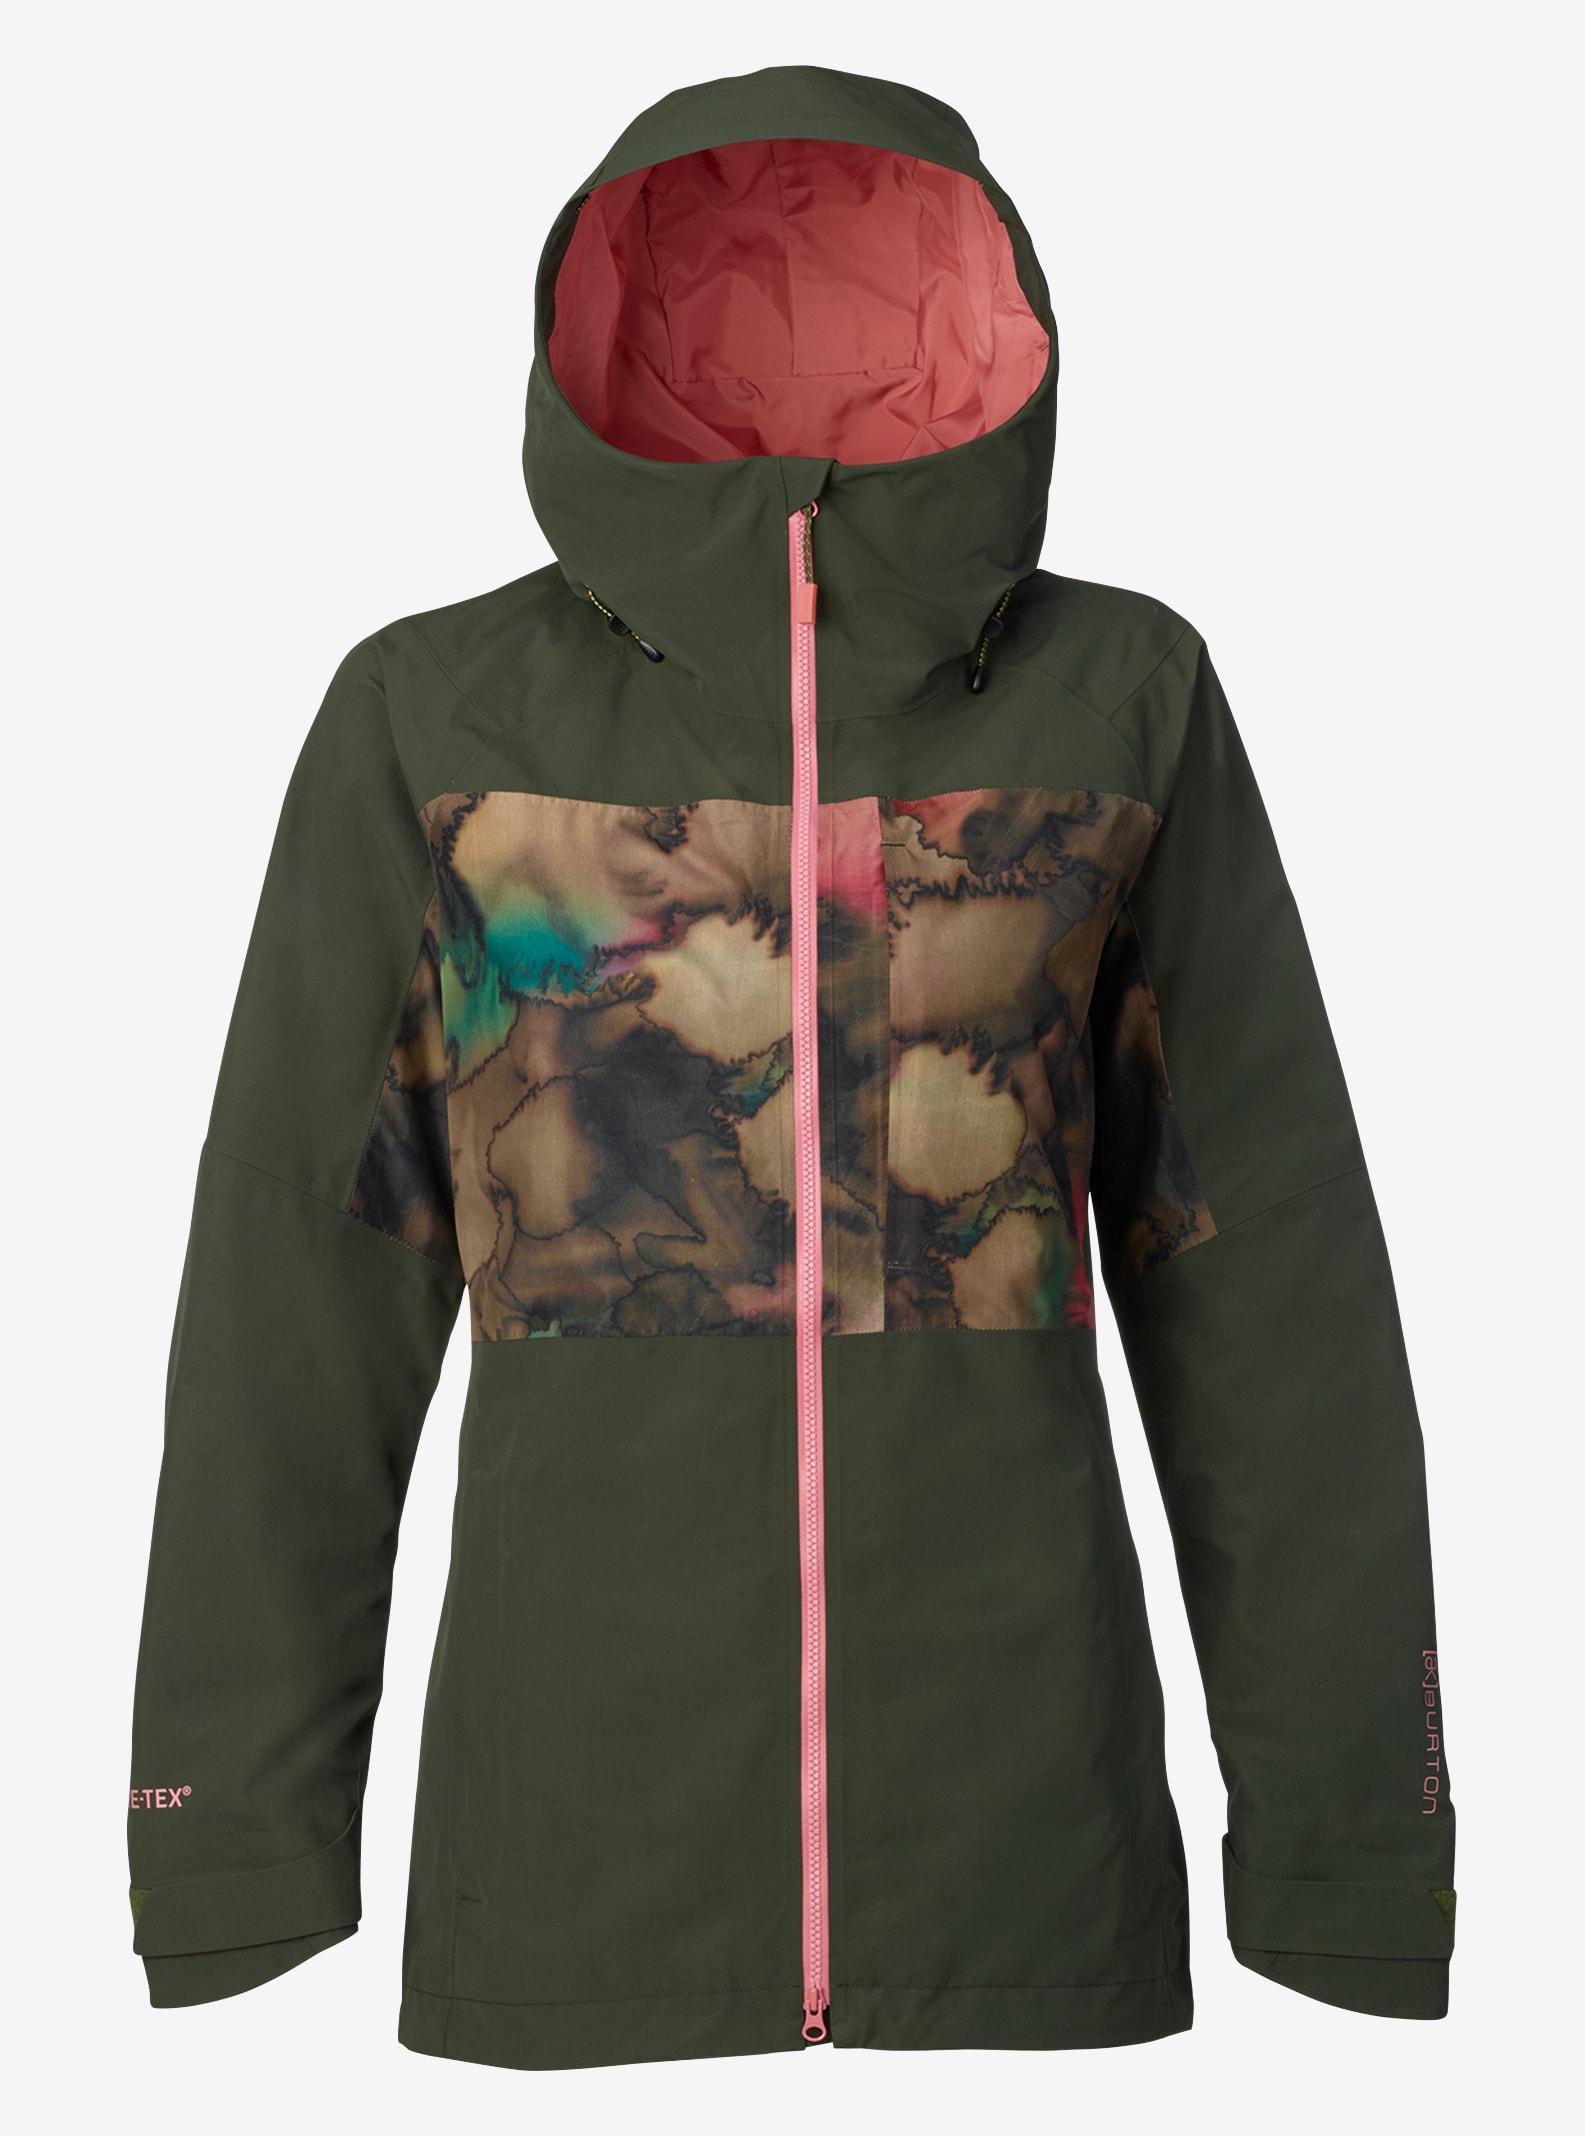 Women's Burton [ak] GORE‑TEX® 2L Blade Jacket shown in Forest Night / Tea Camo